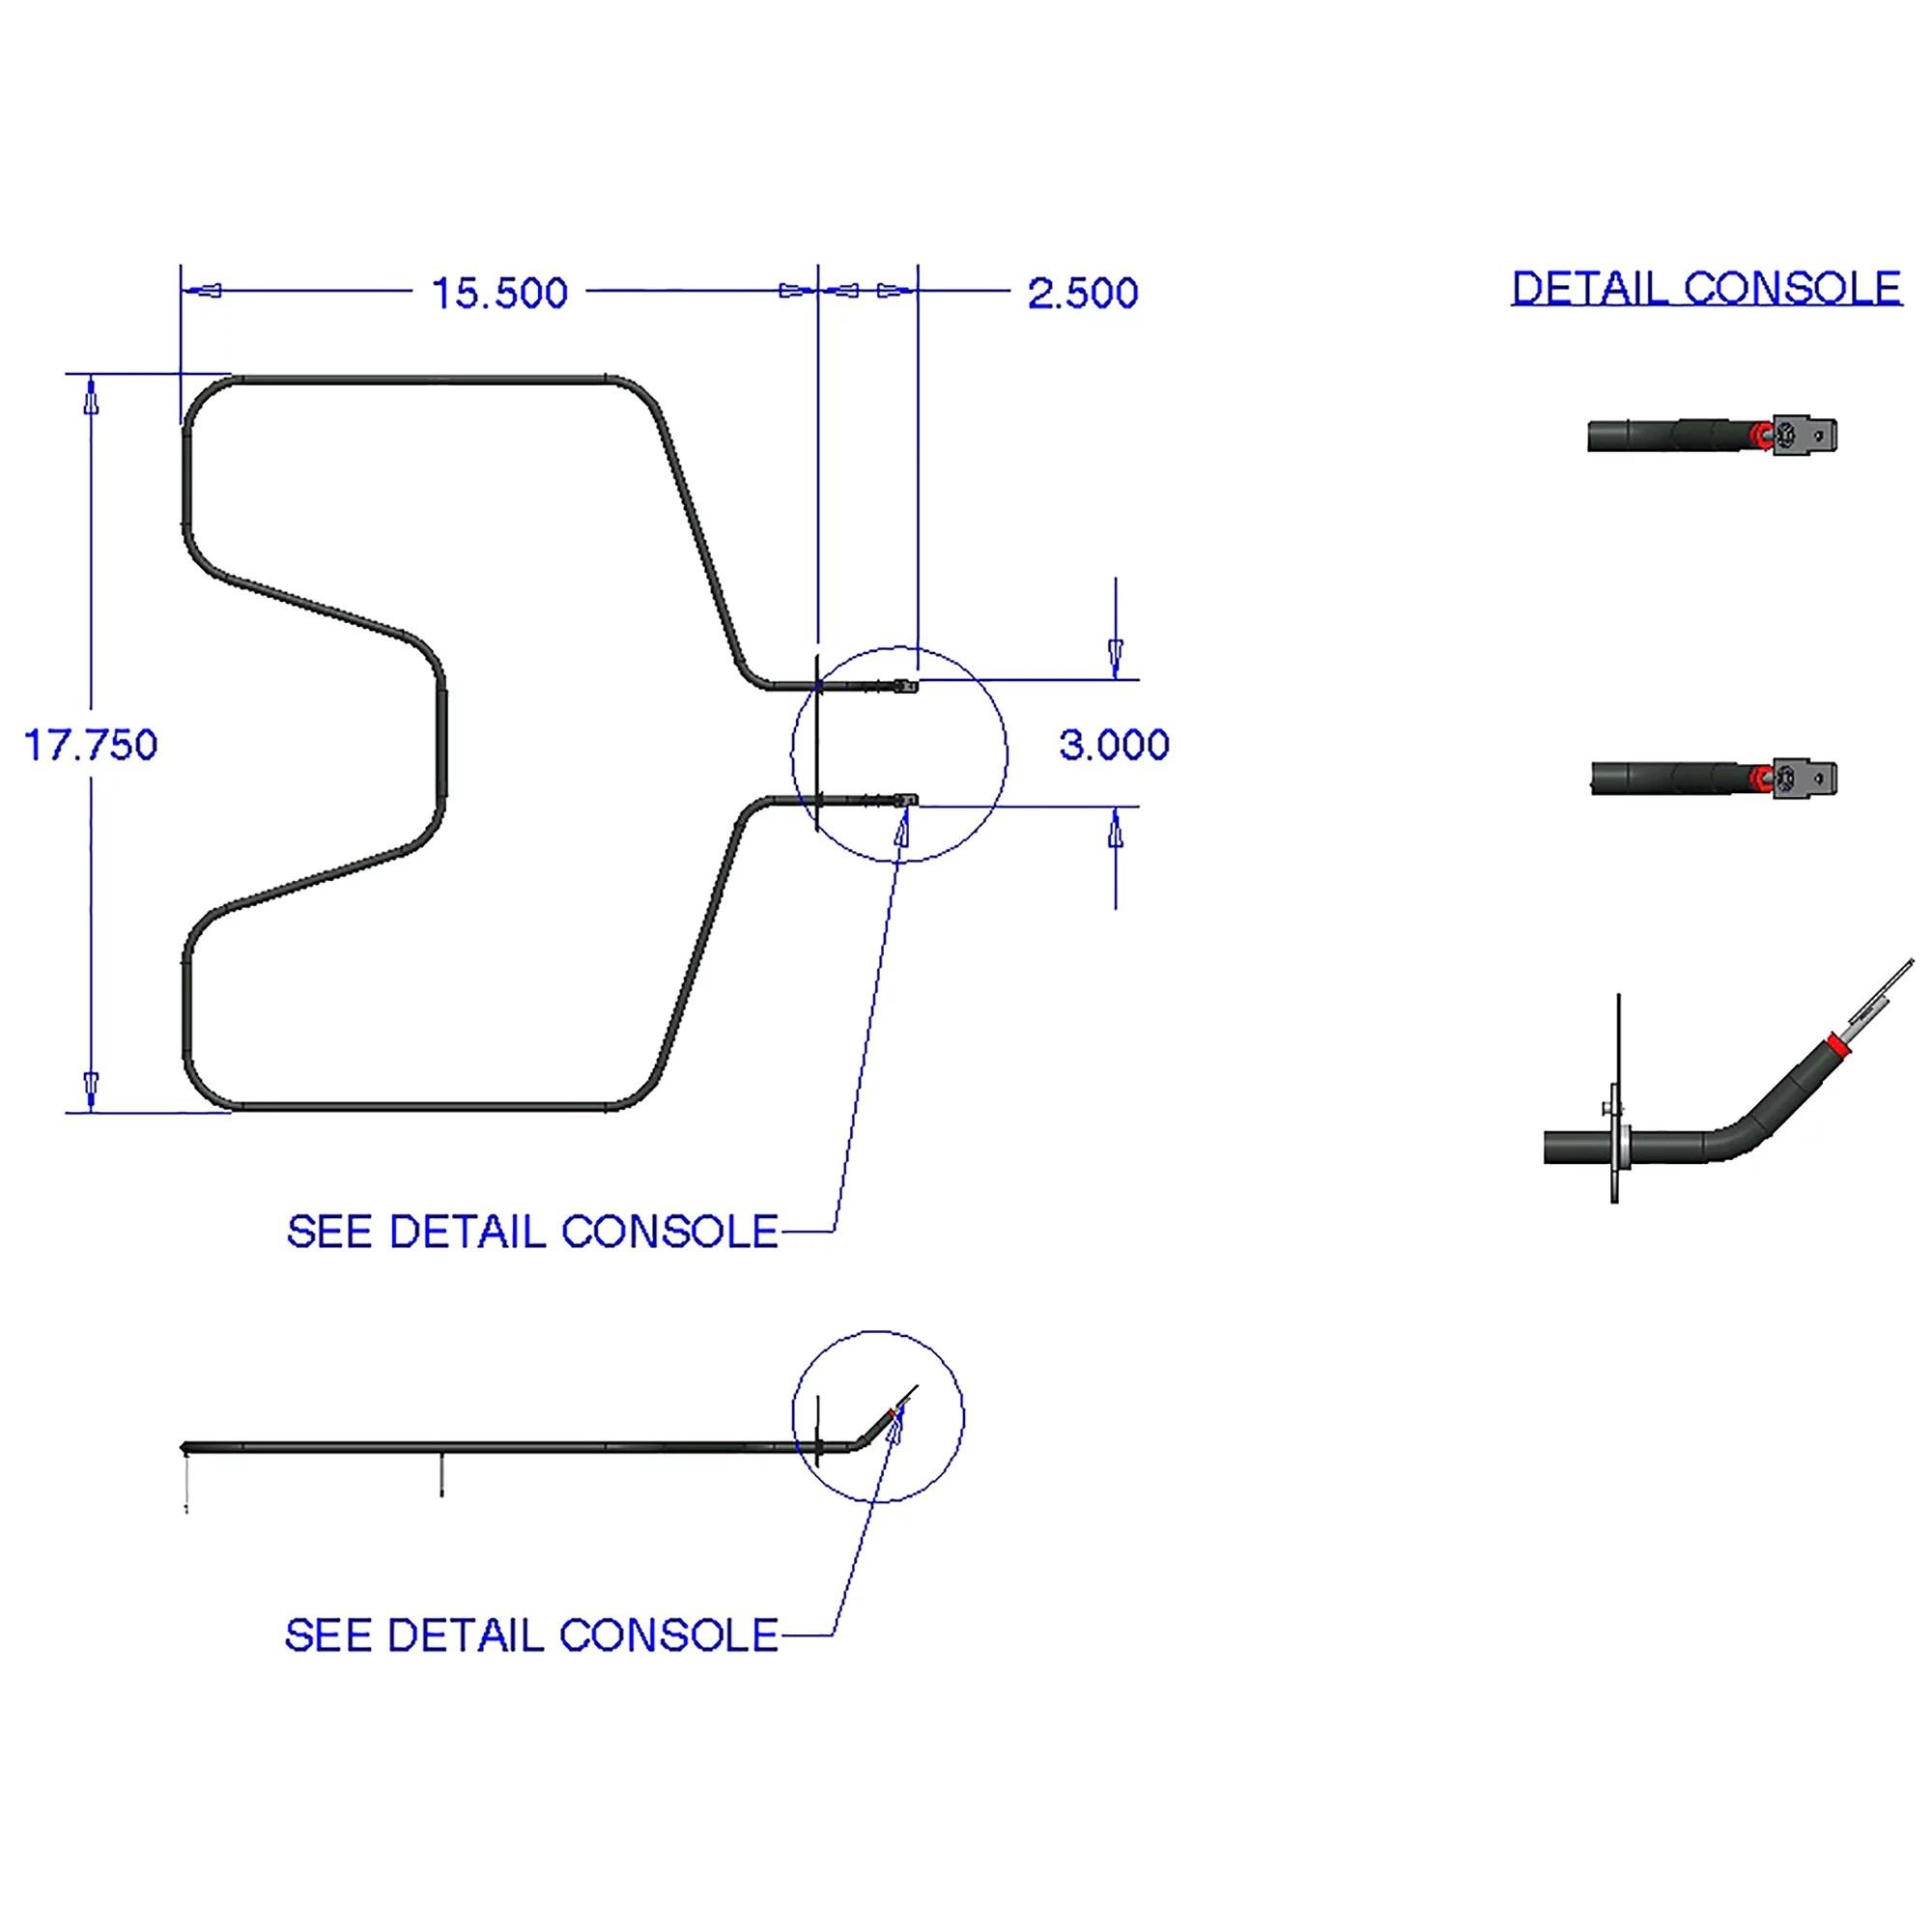 Oven Wiring Diagram 110v Illustration Of 220v Rh Thepersonalloan Site Outlet Cargo Trailer Conversion